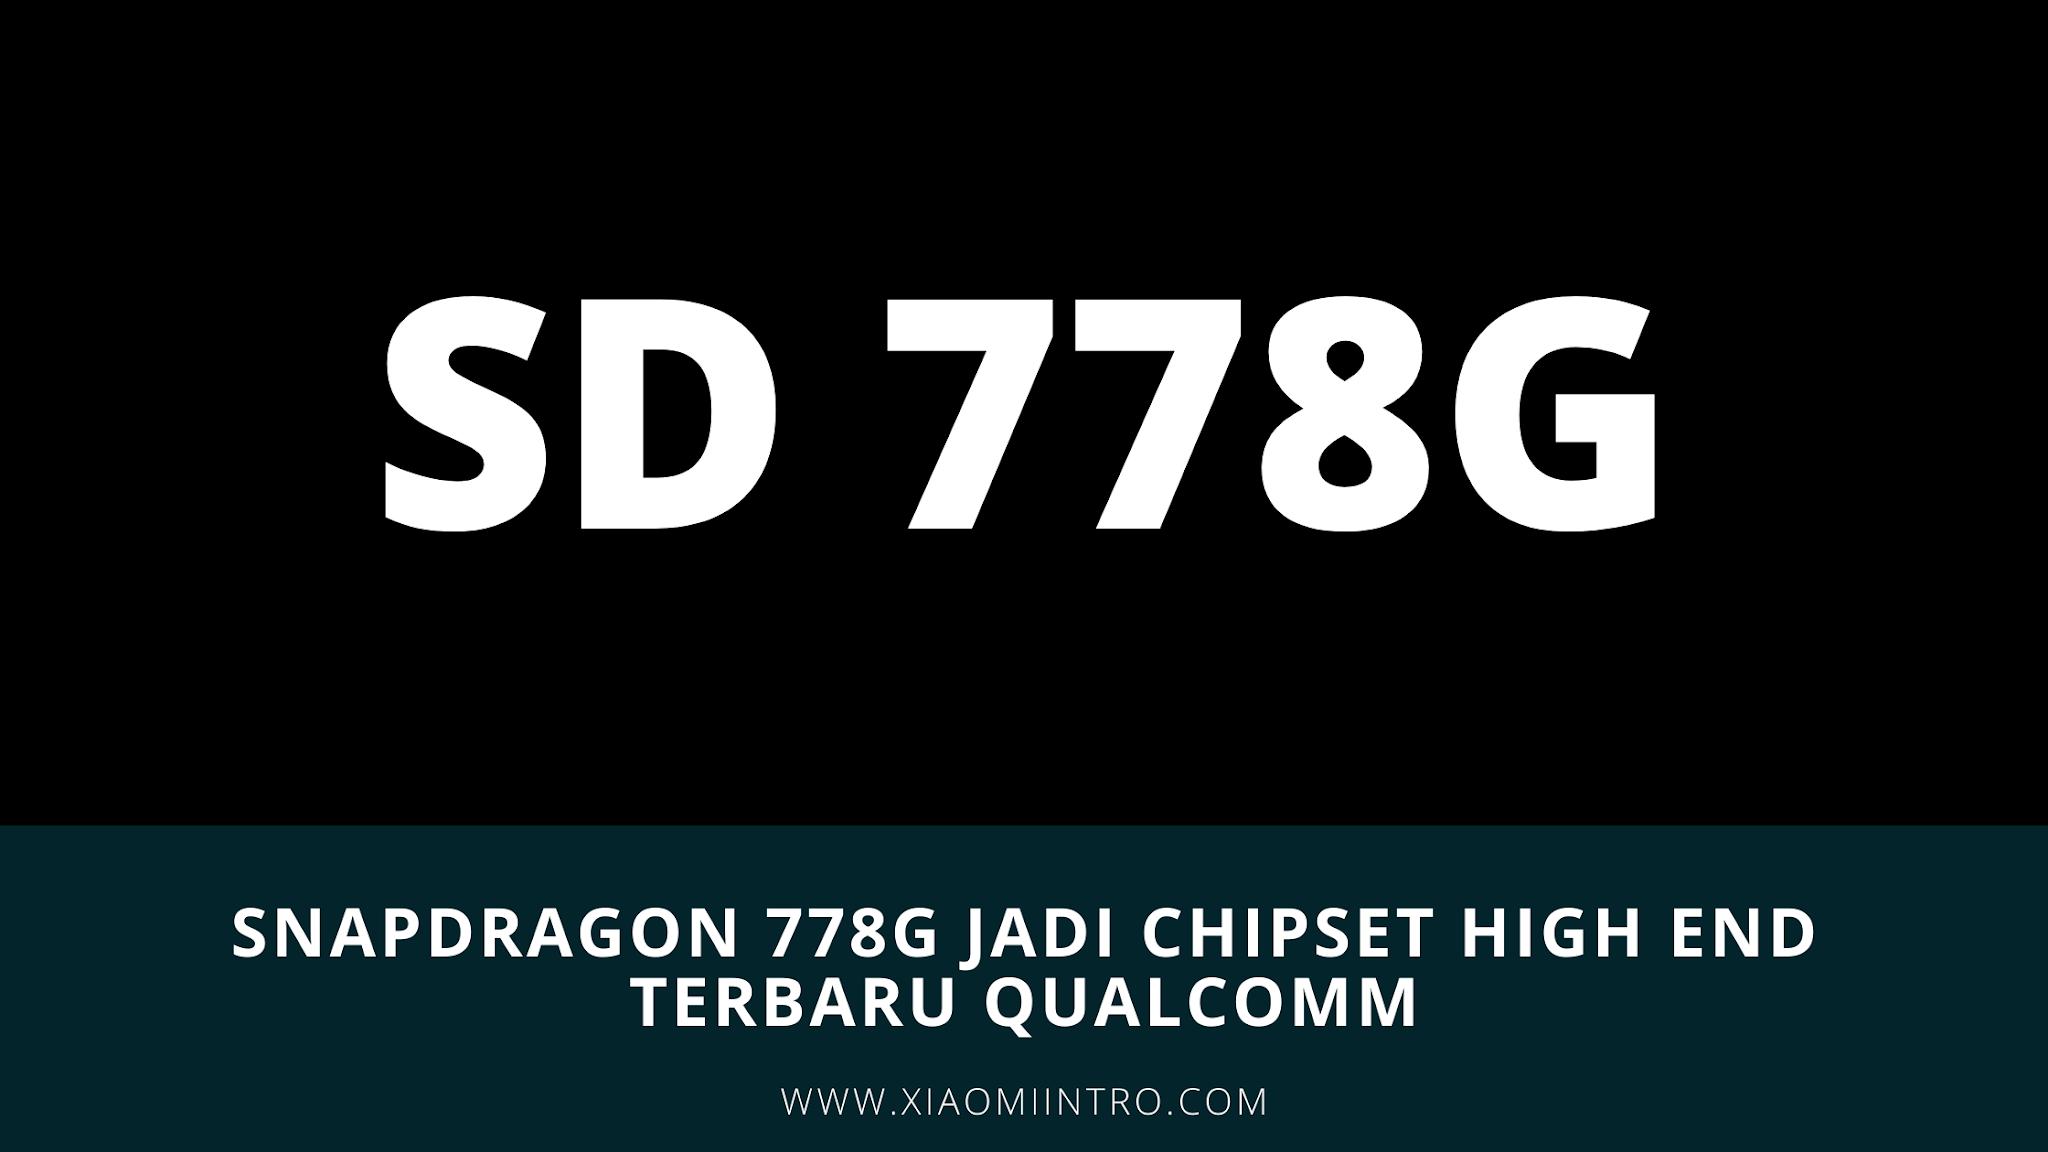 Snapdragon 778G Jadi Chipset High End Terbaru Qualcomm